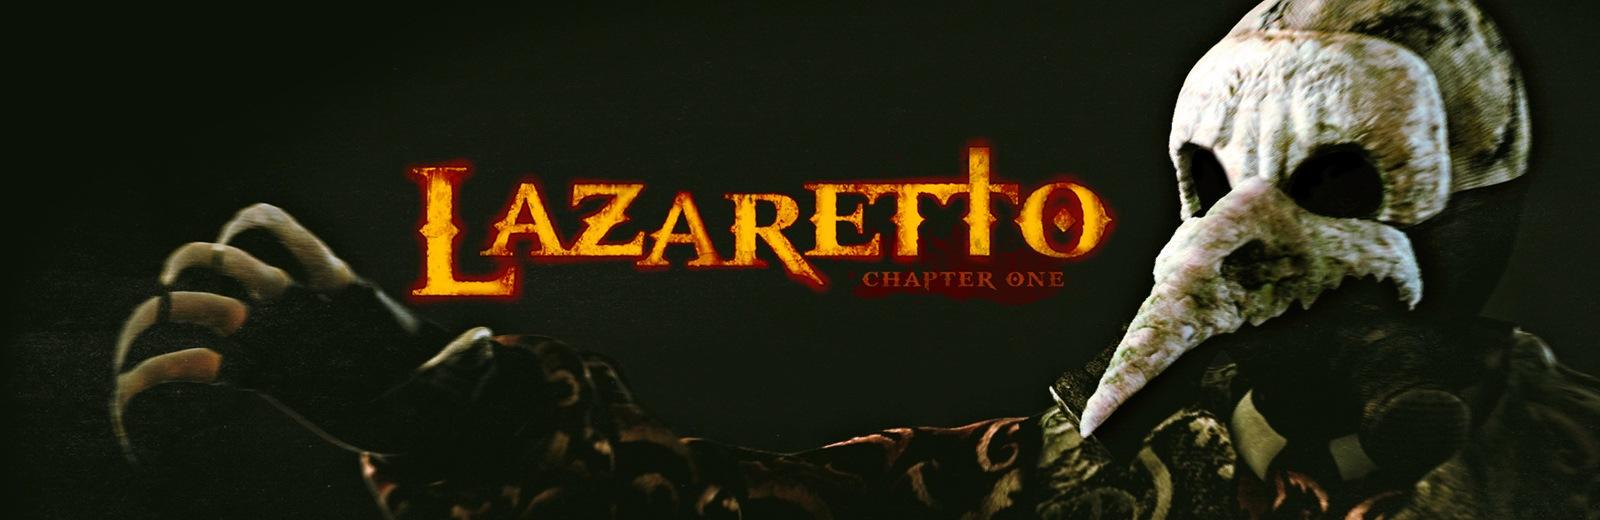 Lazaretto - Horror Game - T-shirt Store Store